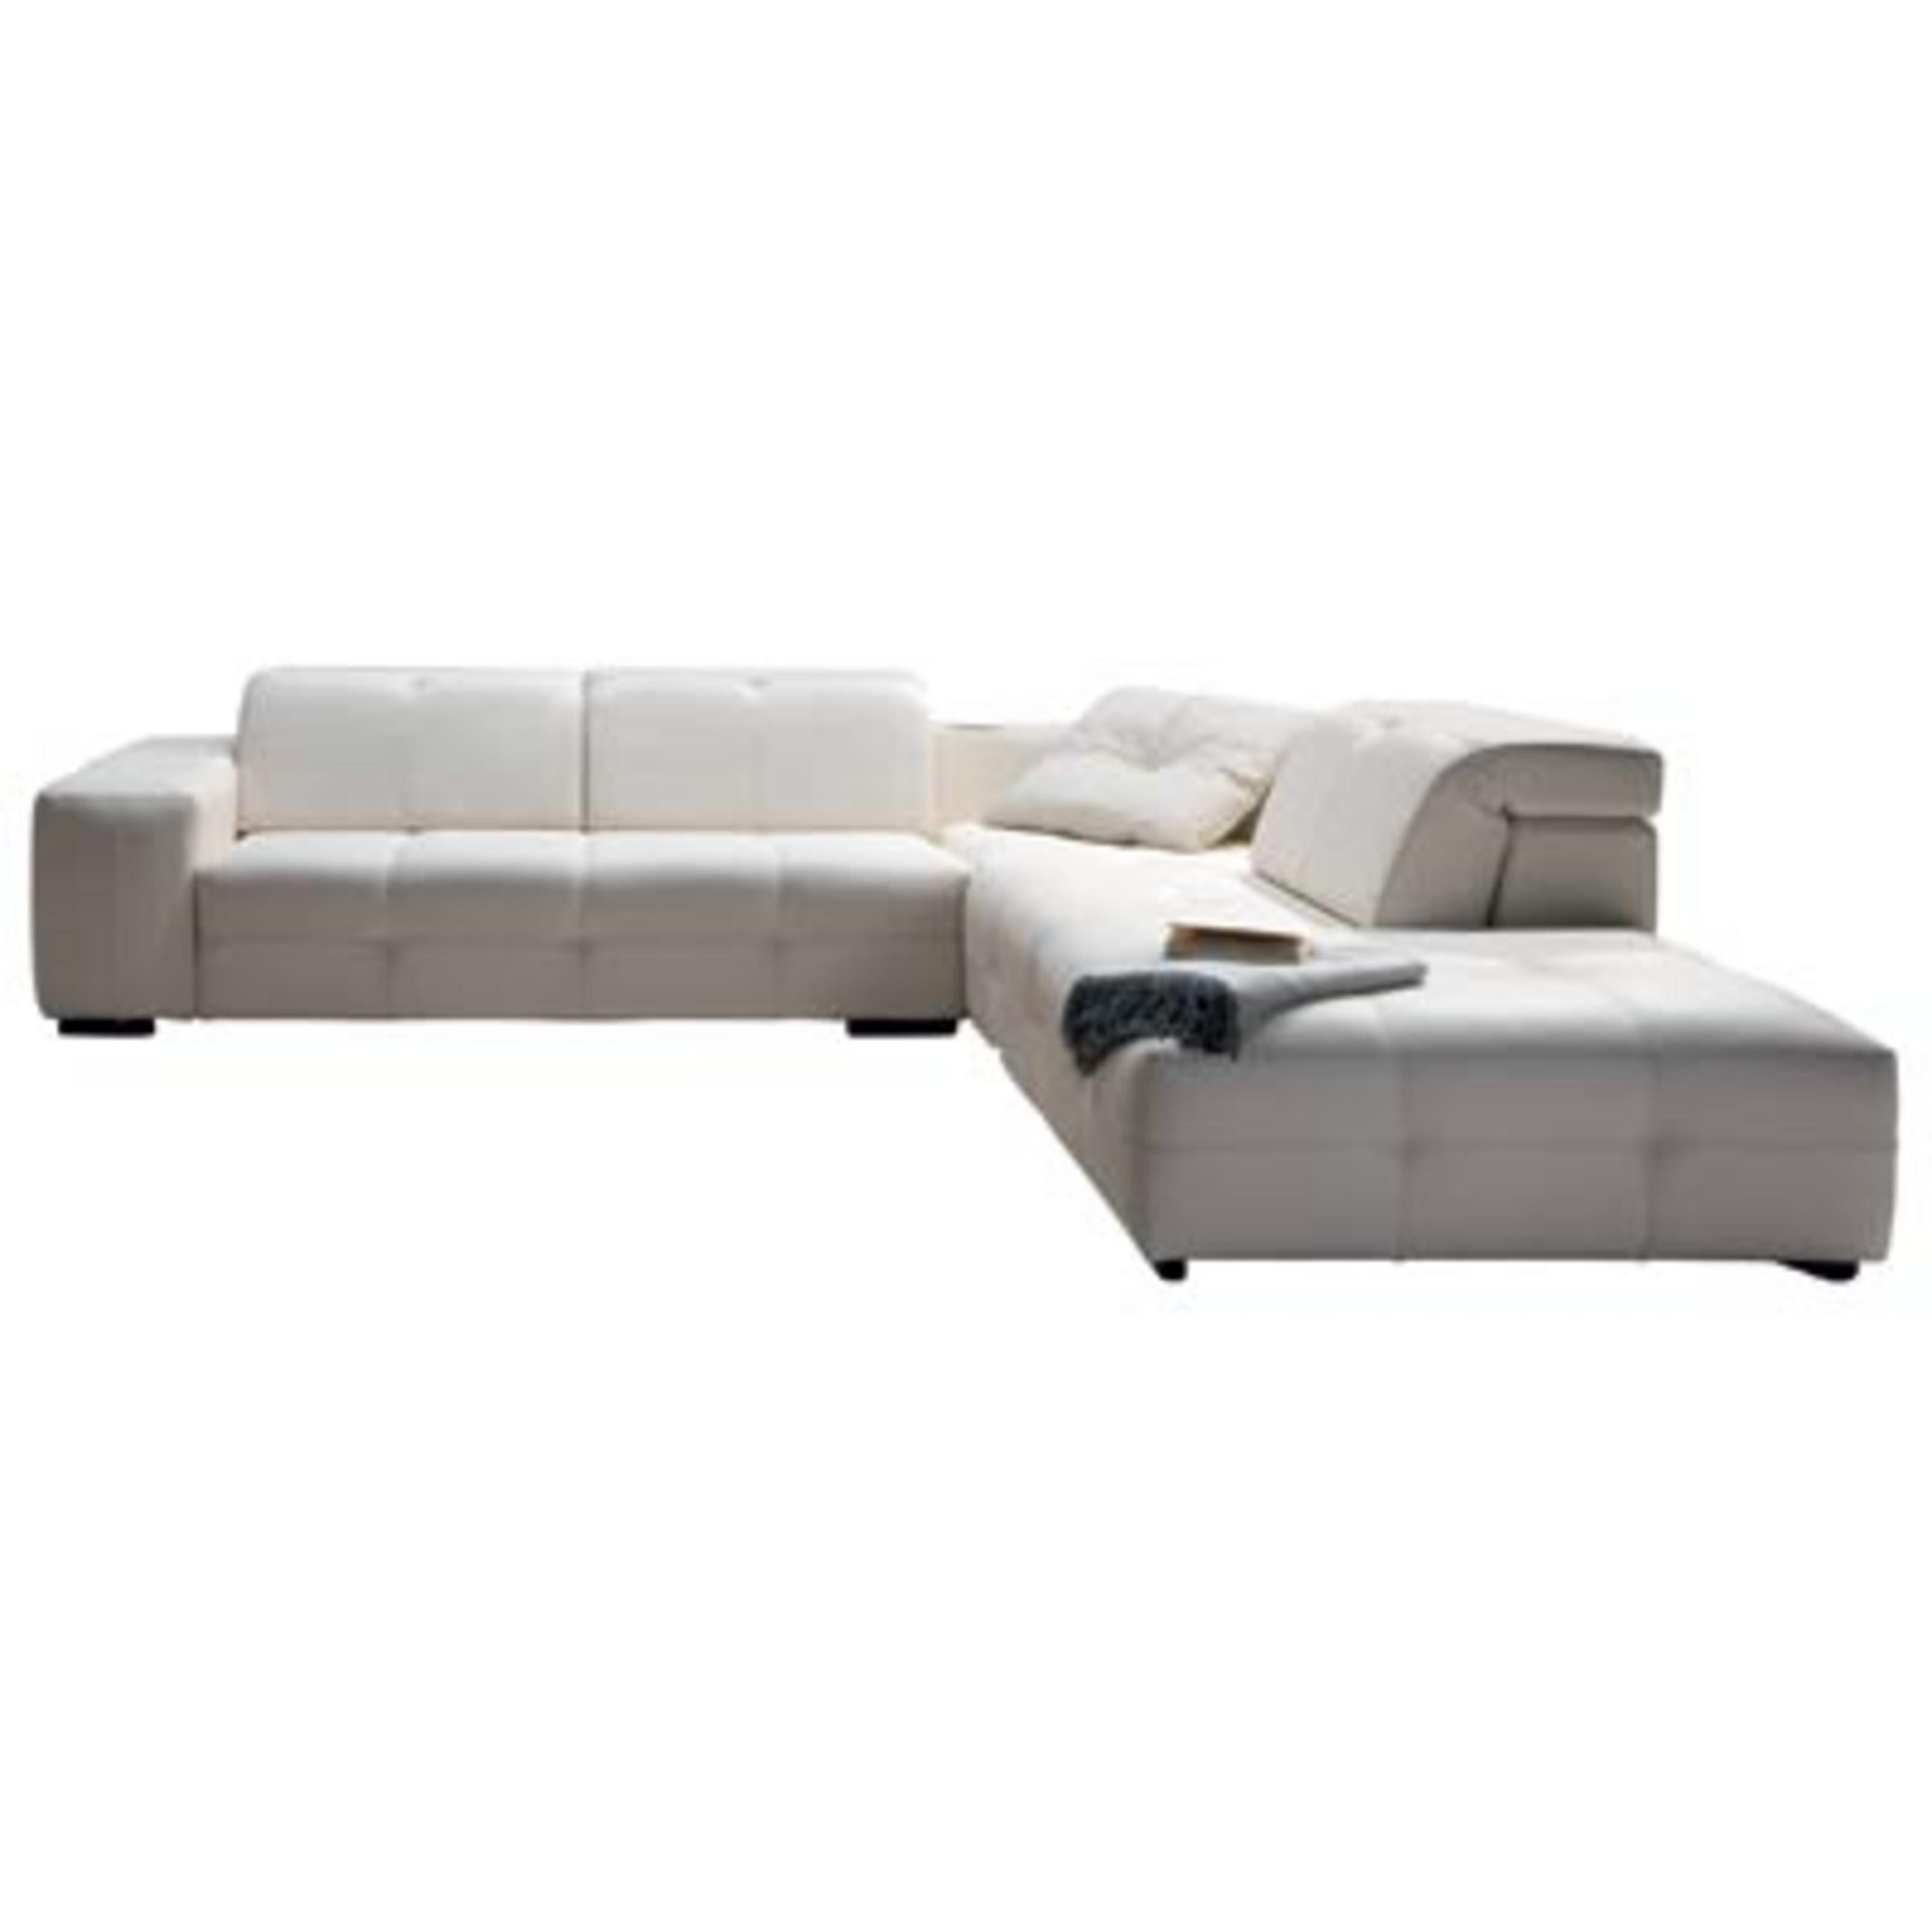 Scandinavia Furniture NATUZZI PLAZA CREAM LEATHER SECTIONAL